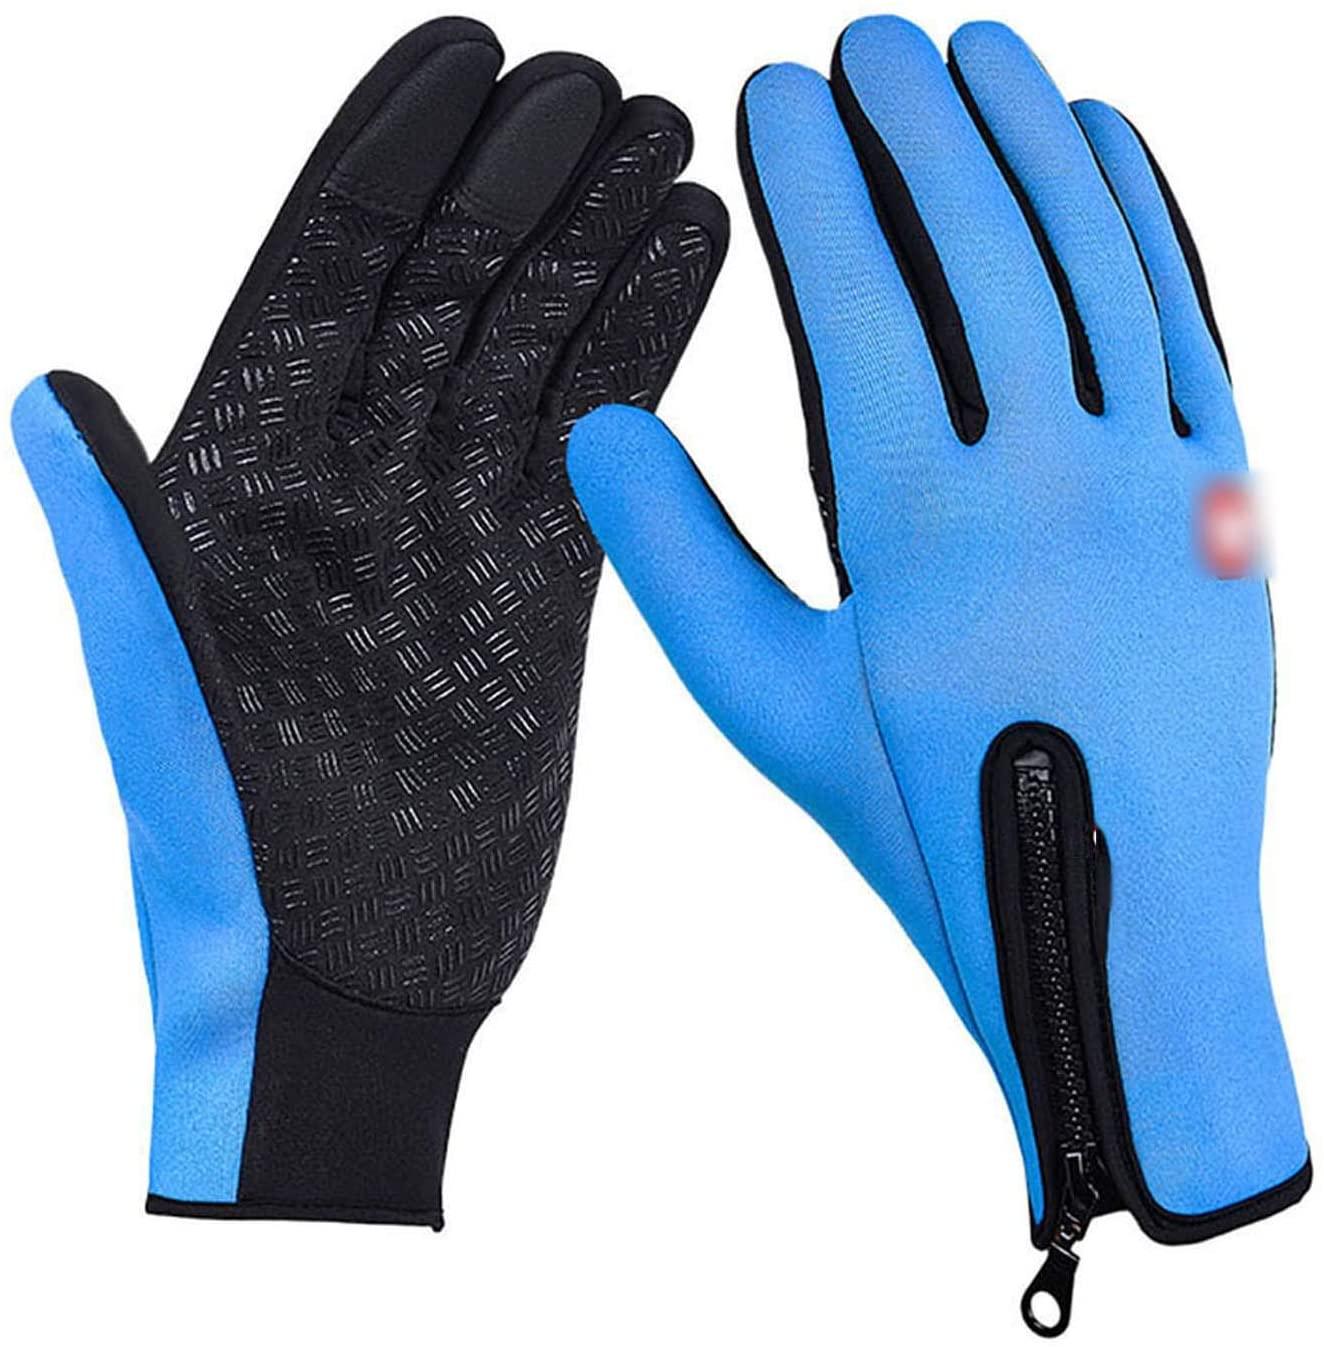 YR5V4V Winter Women Men Ski Snowboard Gloves Motorcycle Riding Waterproof Snow Windstopper Camping Leisure Skiing Gloves,YZ0228L,S,Ch